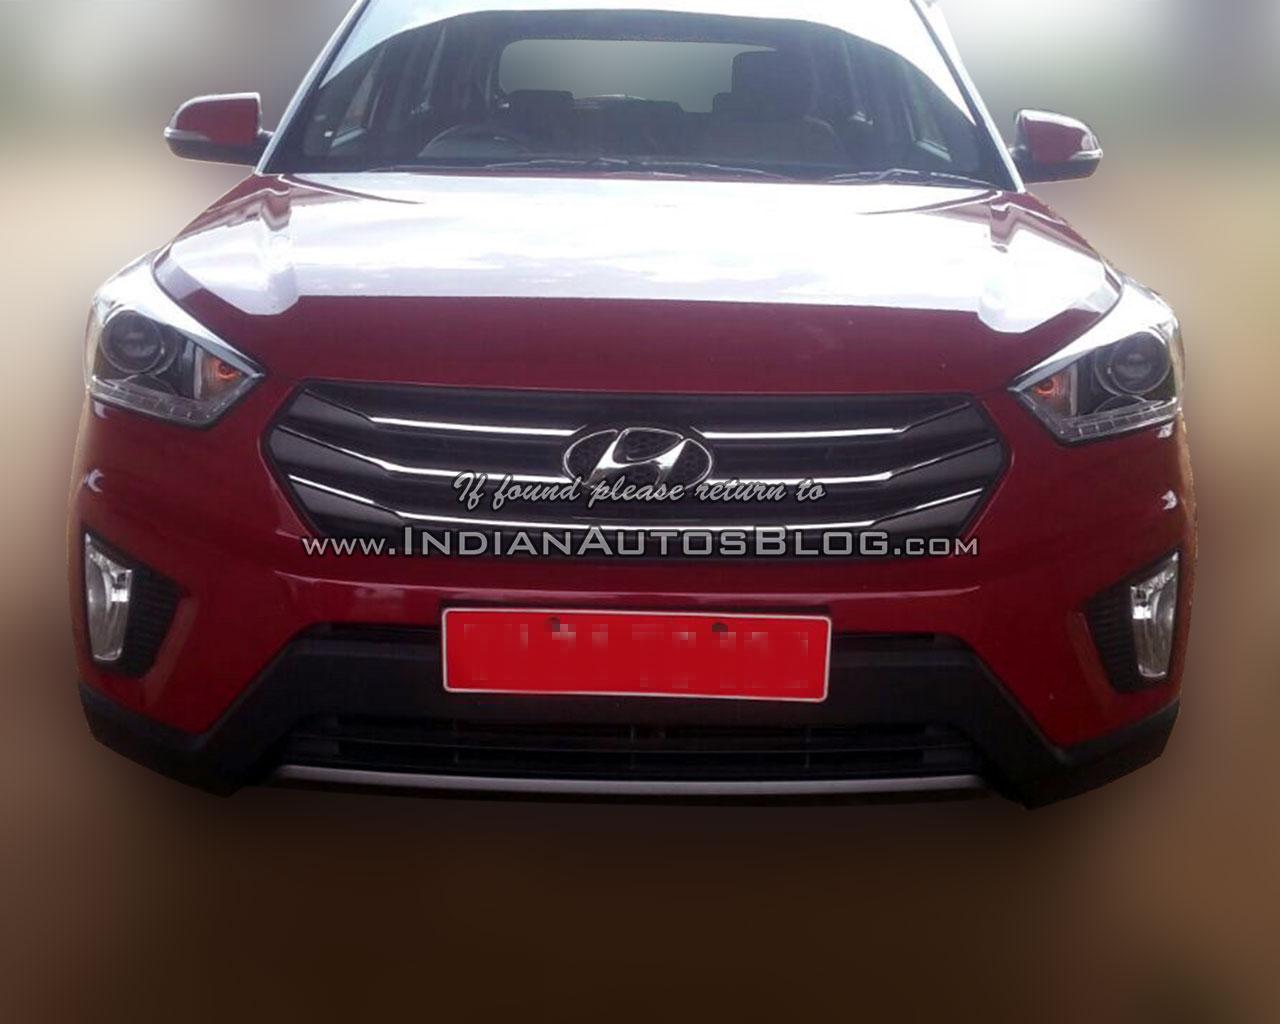 Hyundai Creta SX front spied